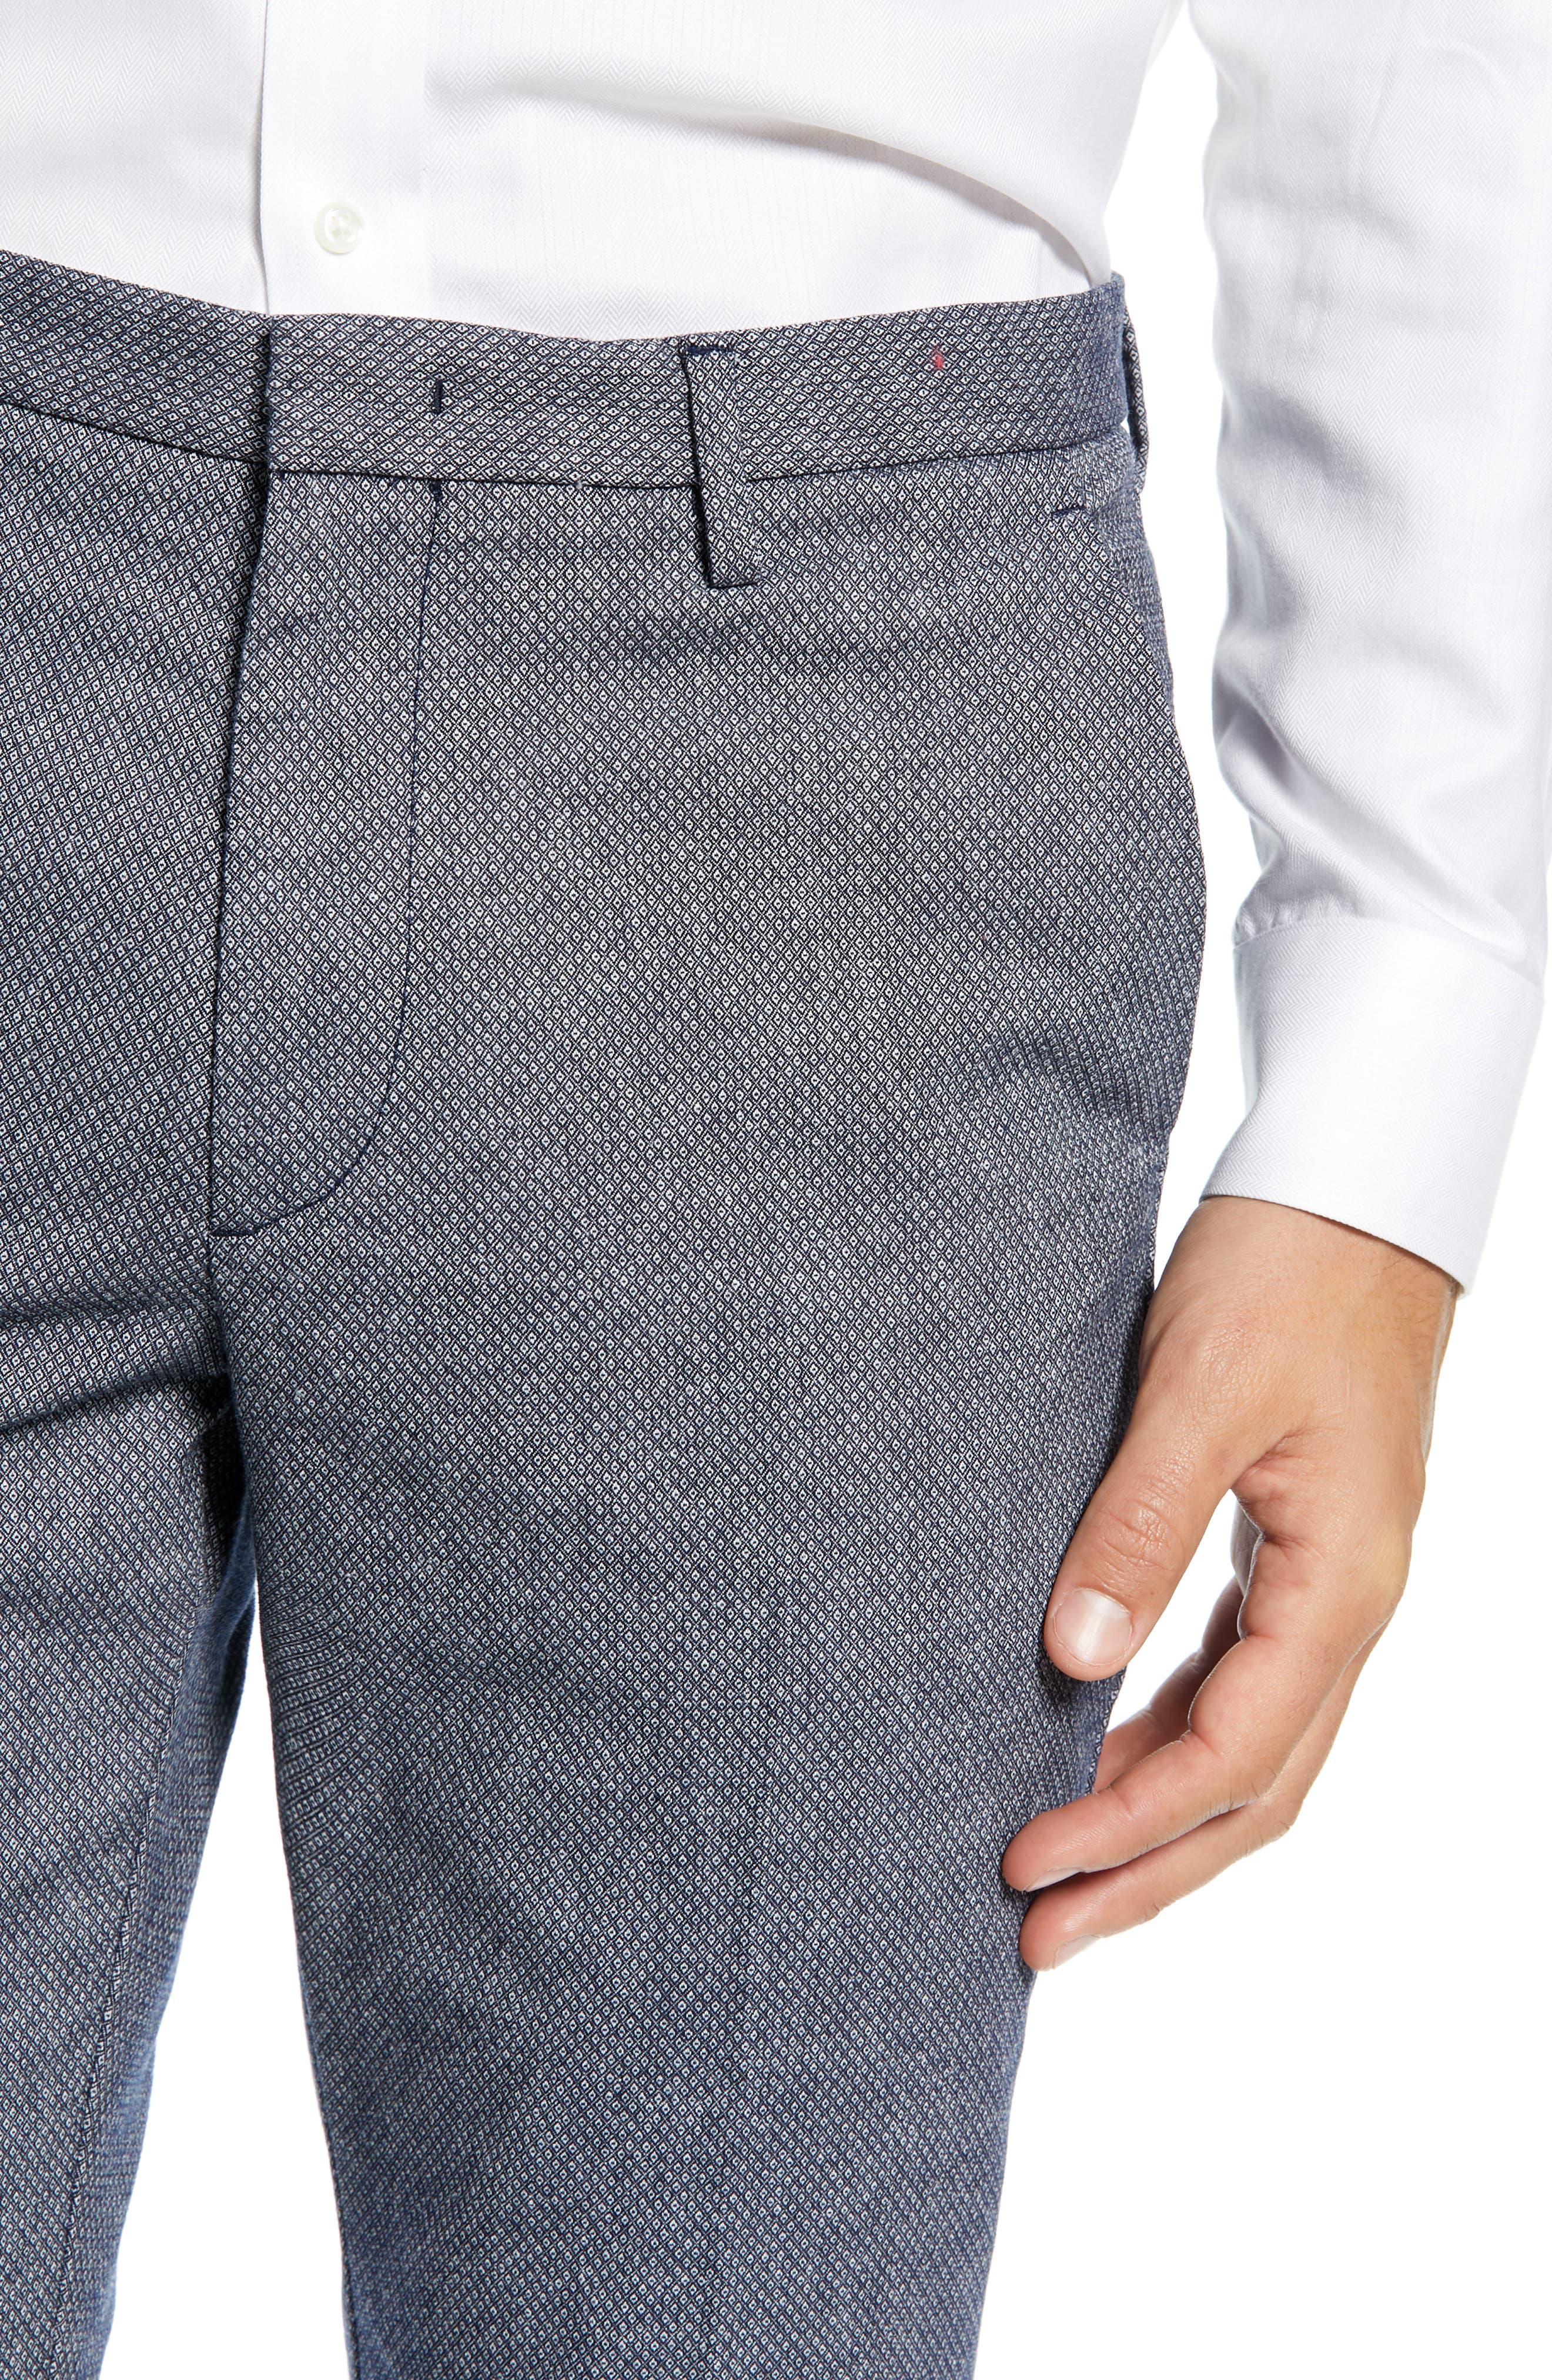 Kaito Slim Fit Pants,                             Alternate thumbnail 4, color,                             NAVY